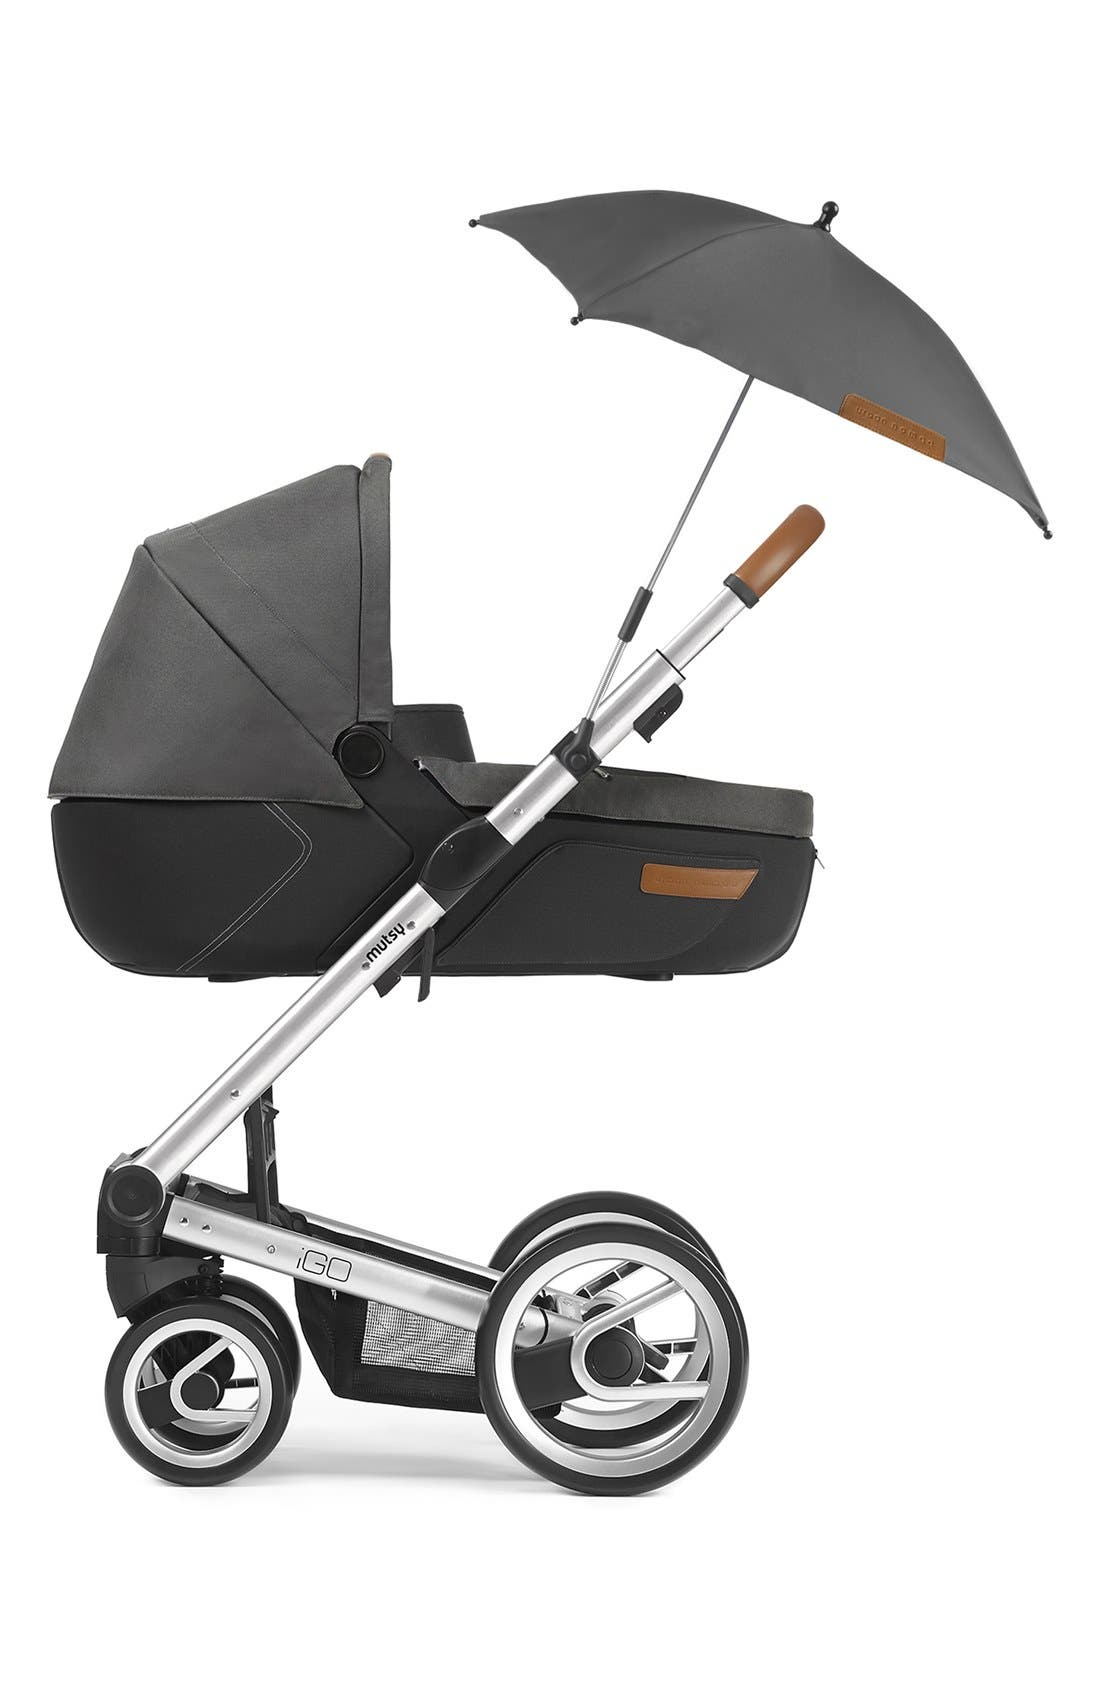 'Igo - Reflect Cosmo Black' Water Resistant Stroller Umbrella,                             Alternate thumbnail 2, color,                             001